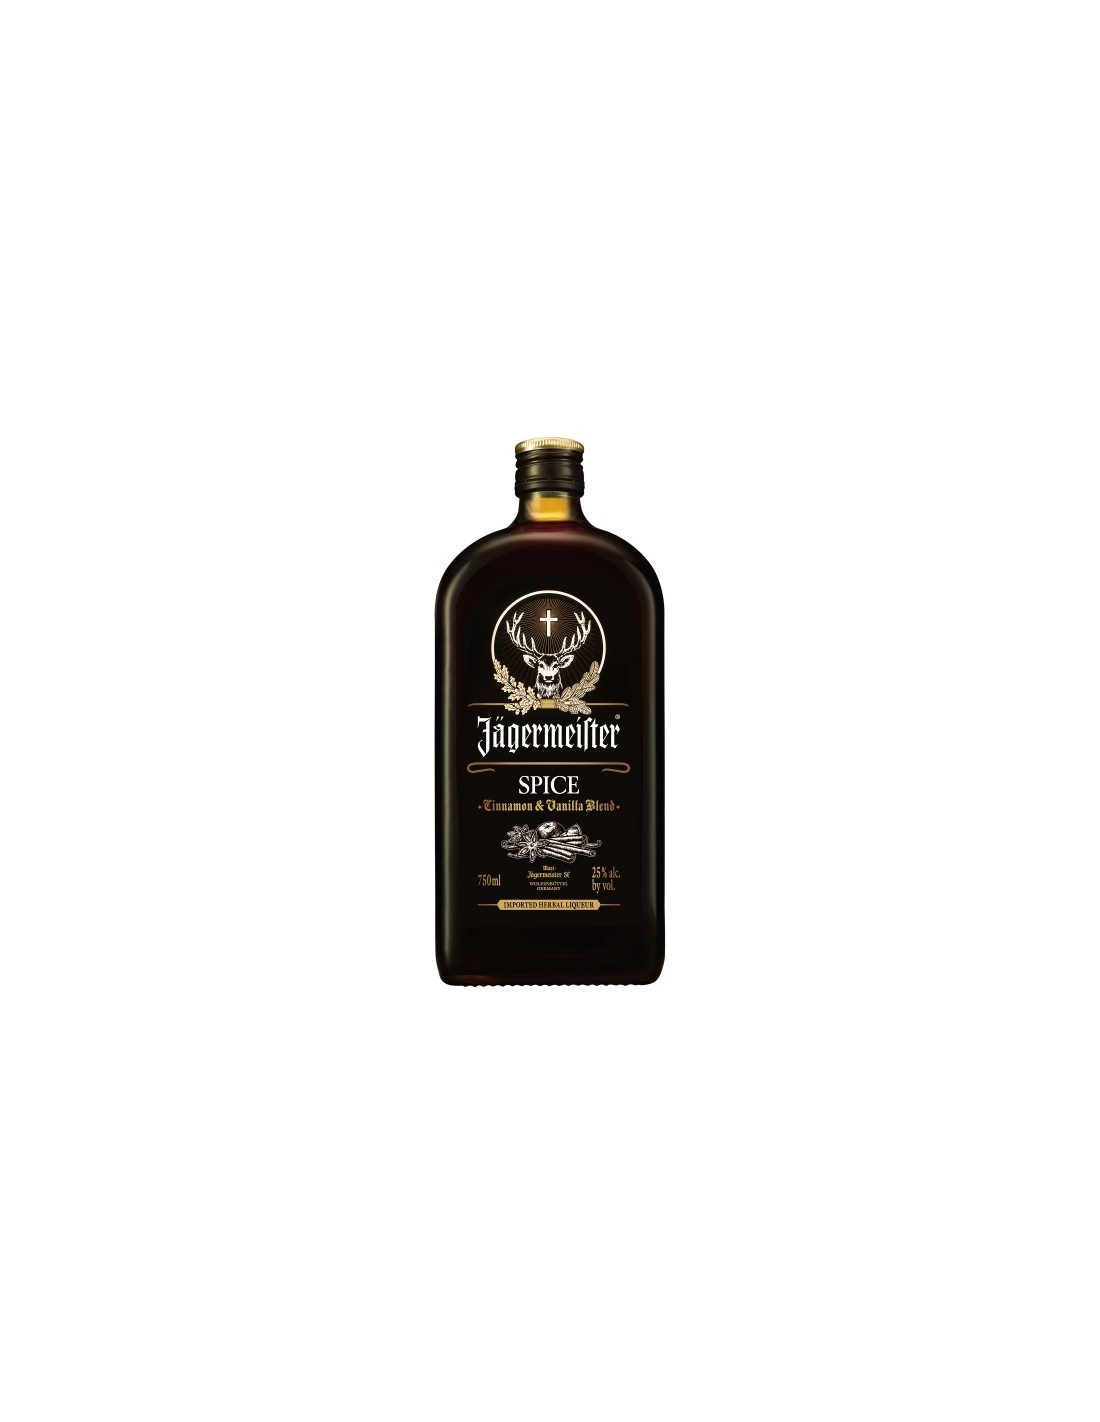 Lichior digestiv Jagermeister Spice, 25% alc., 0.7L, Germania